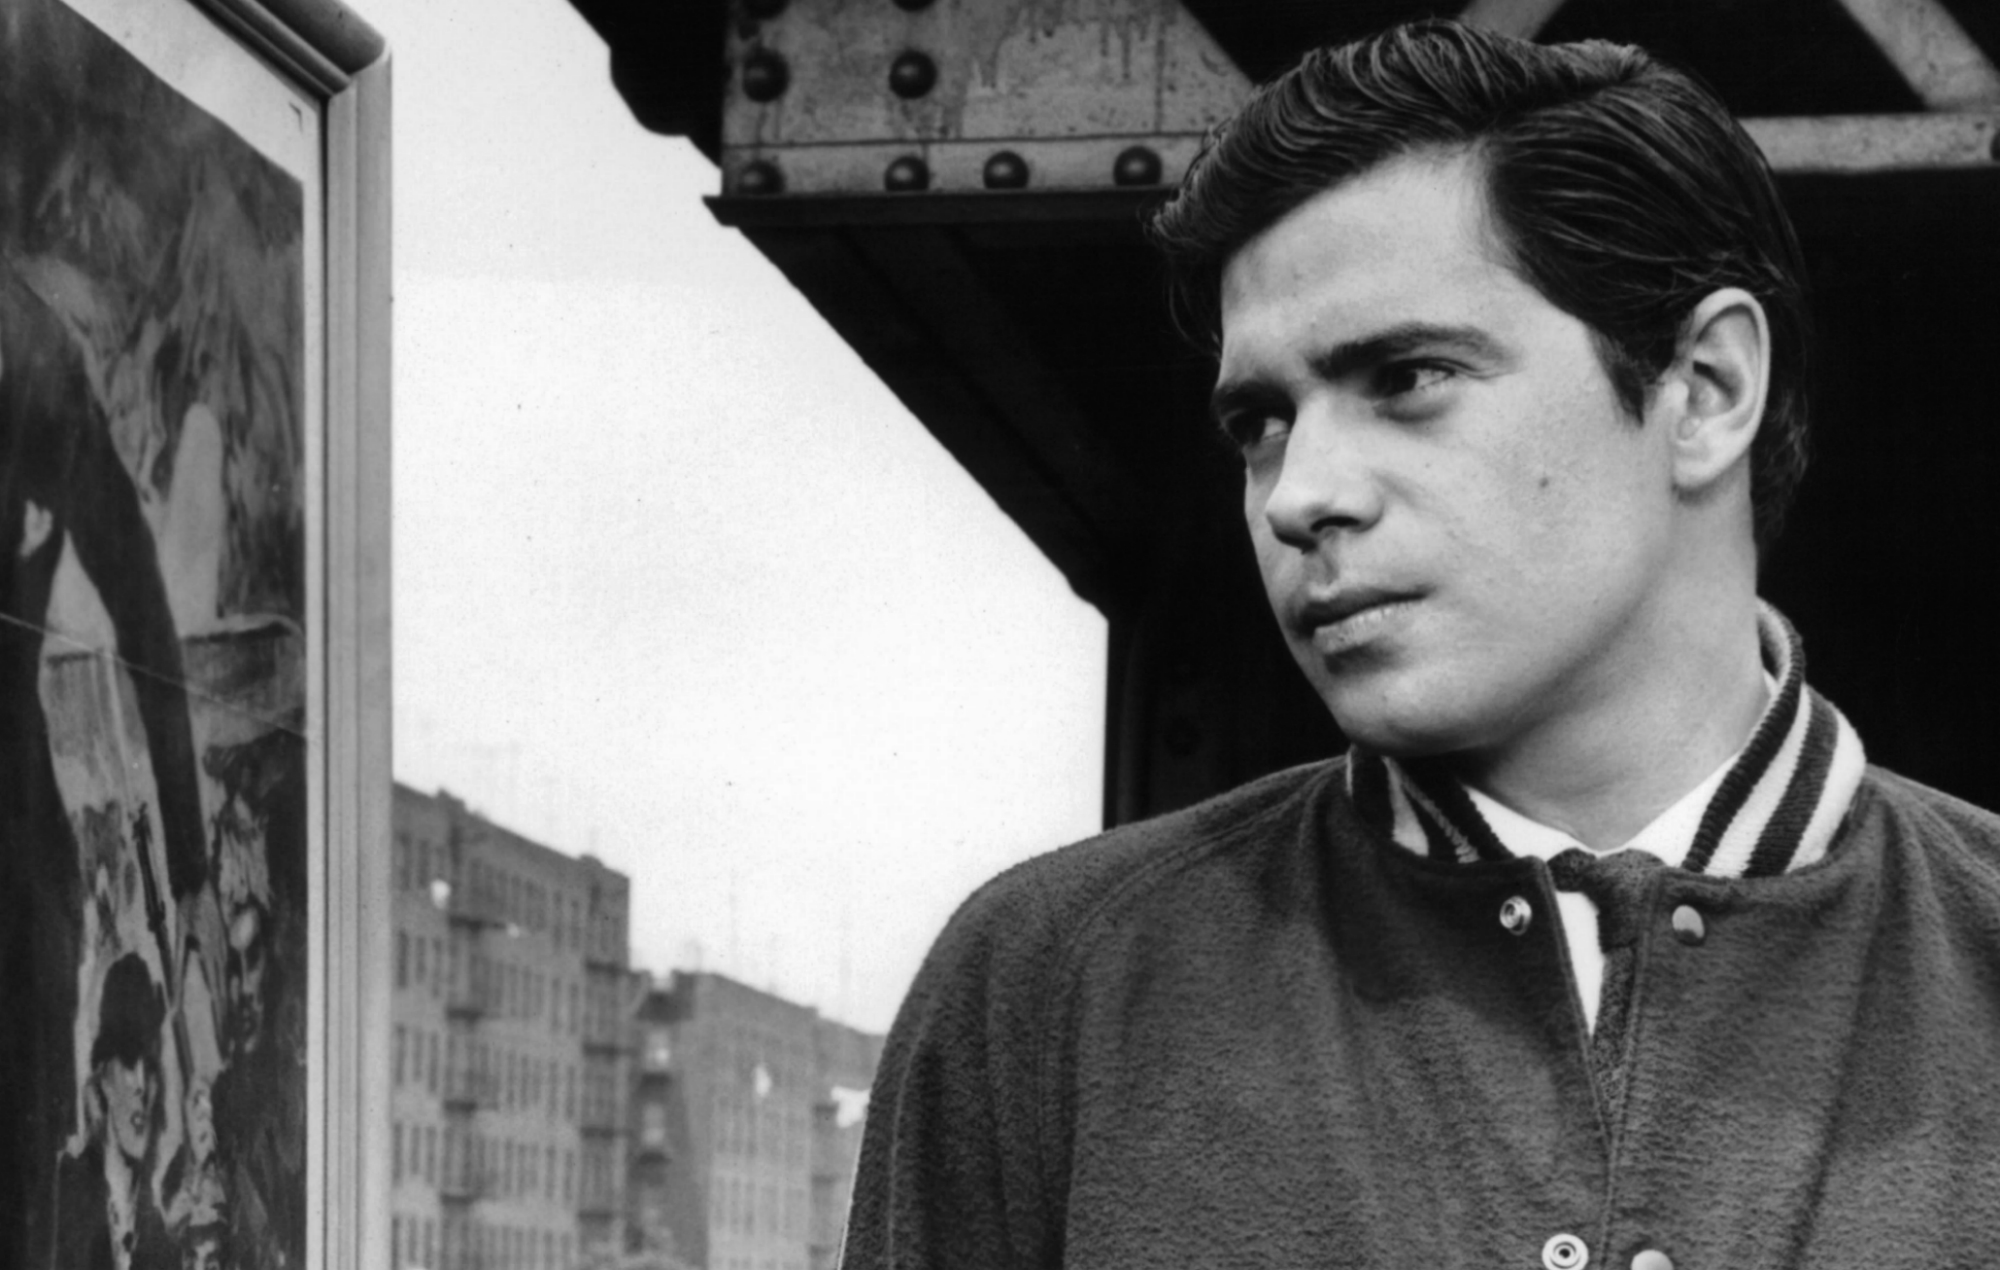 'Seinfeld' and 'Dirty Harry' actor Reni Santoni dies aged 81